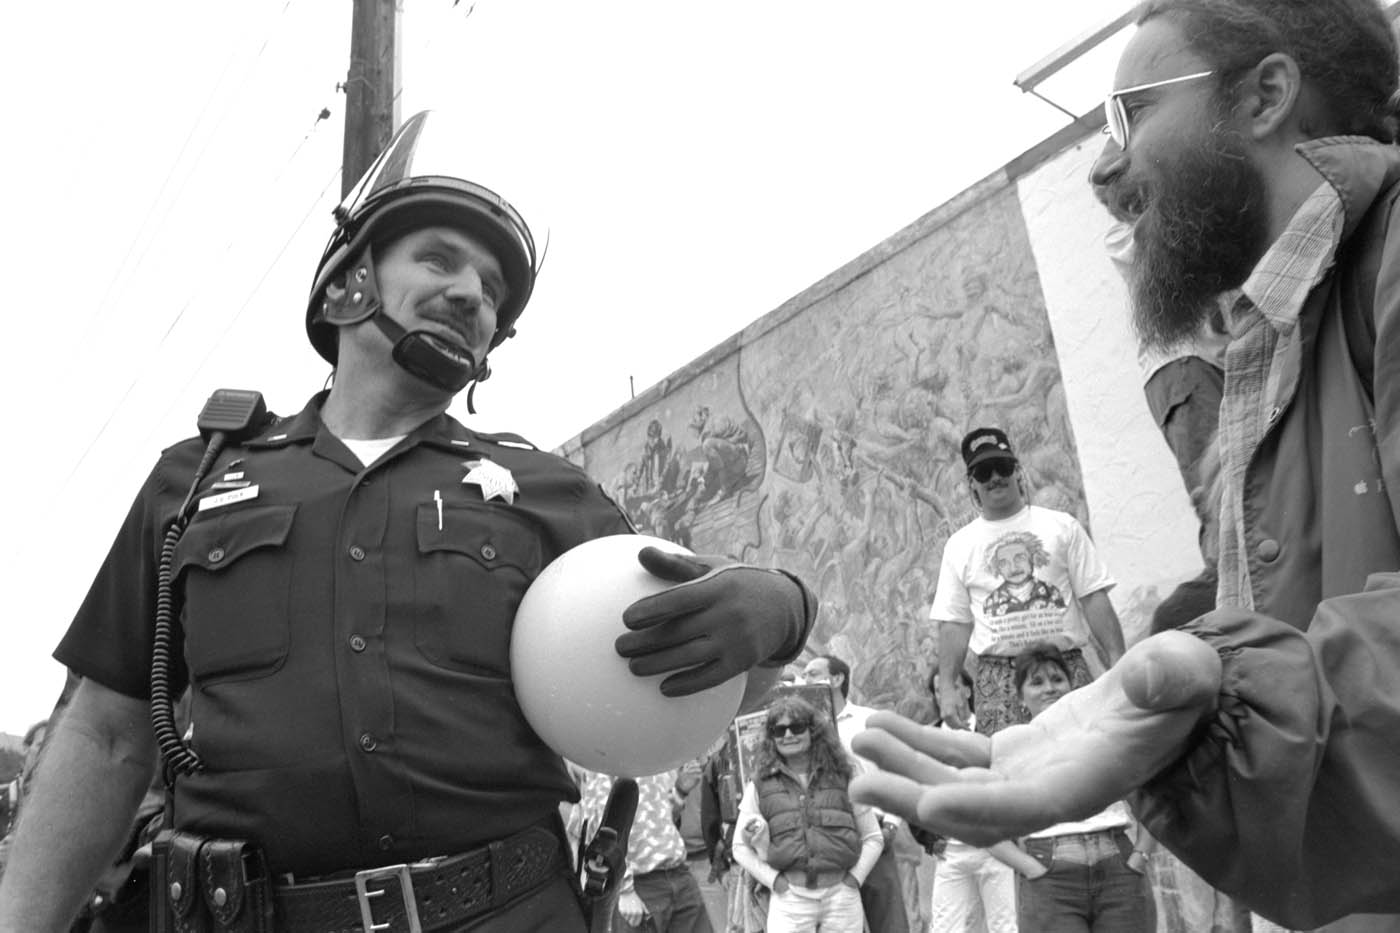 BPD officer actually having fun between demonstrations.